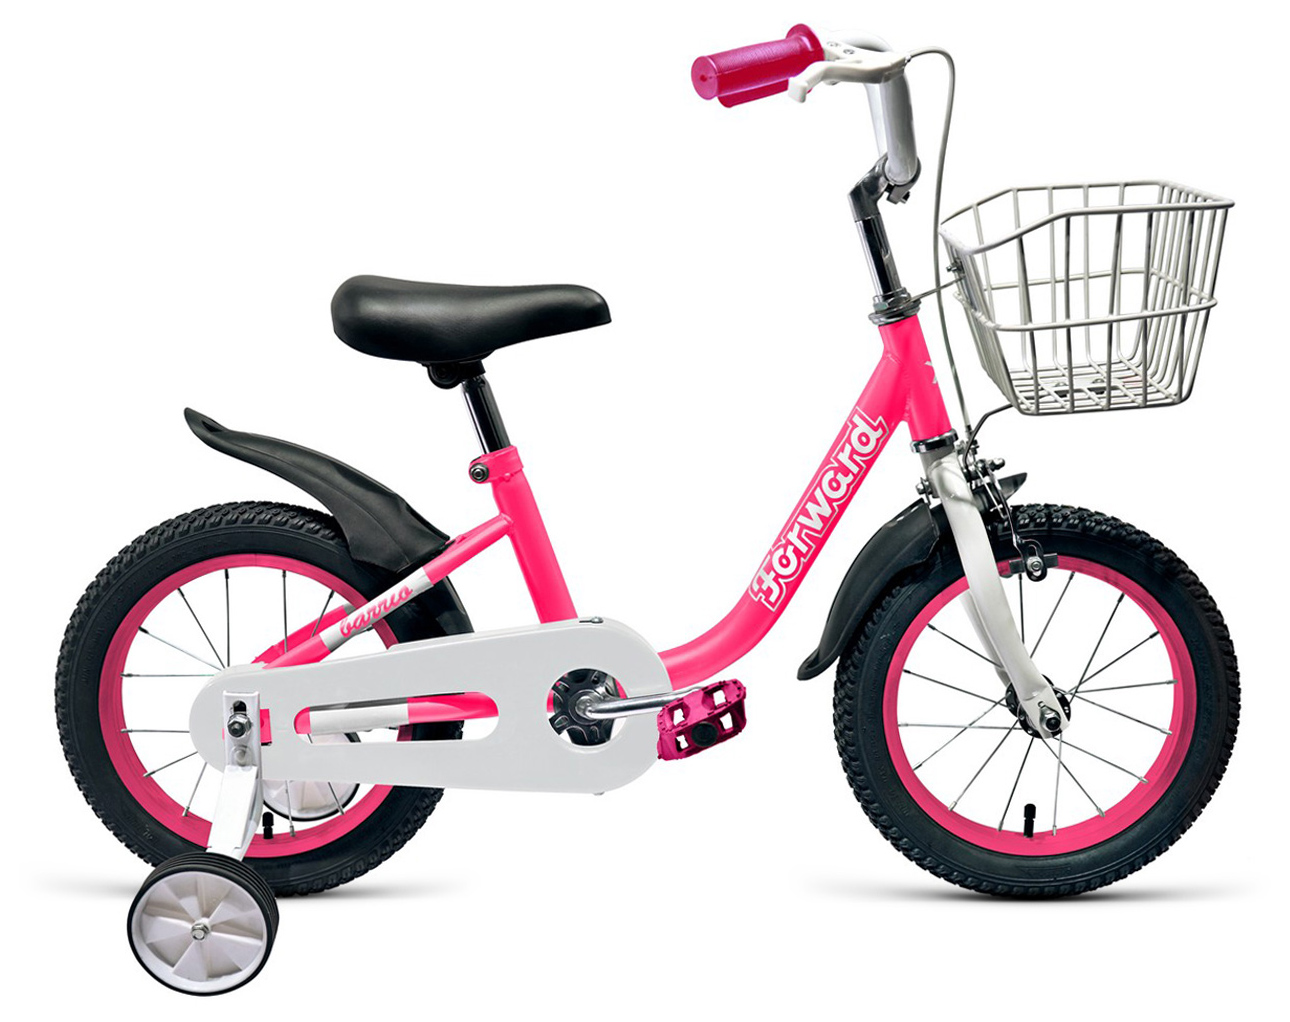 Велосипед Forward Barrio 18 2019 велосипед forward nitro 18 2019